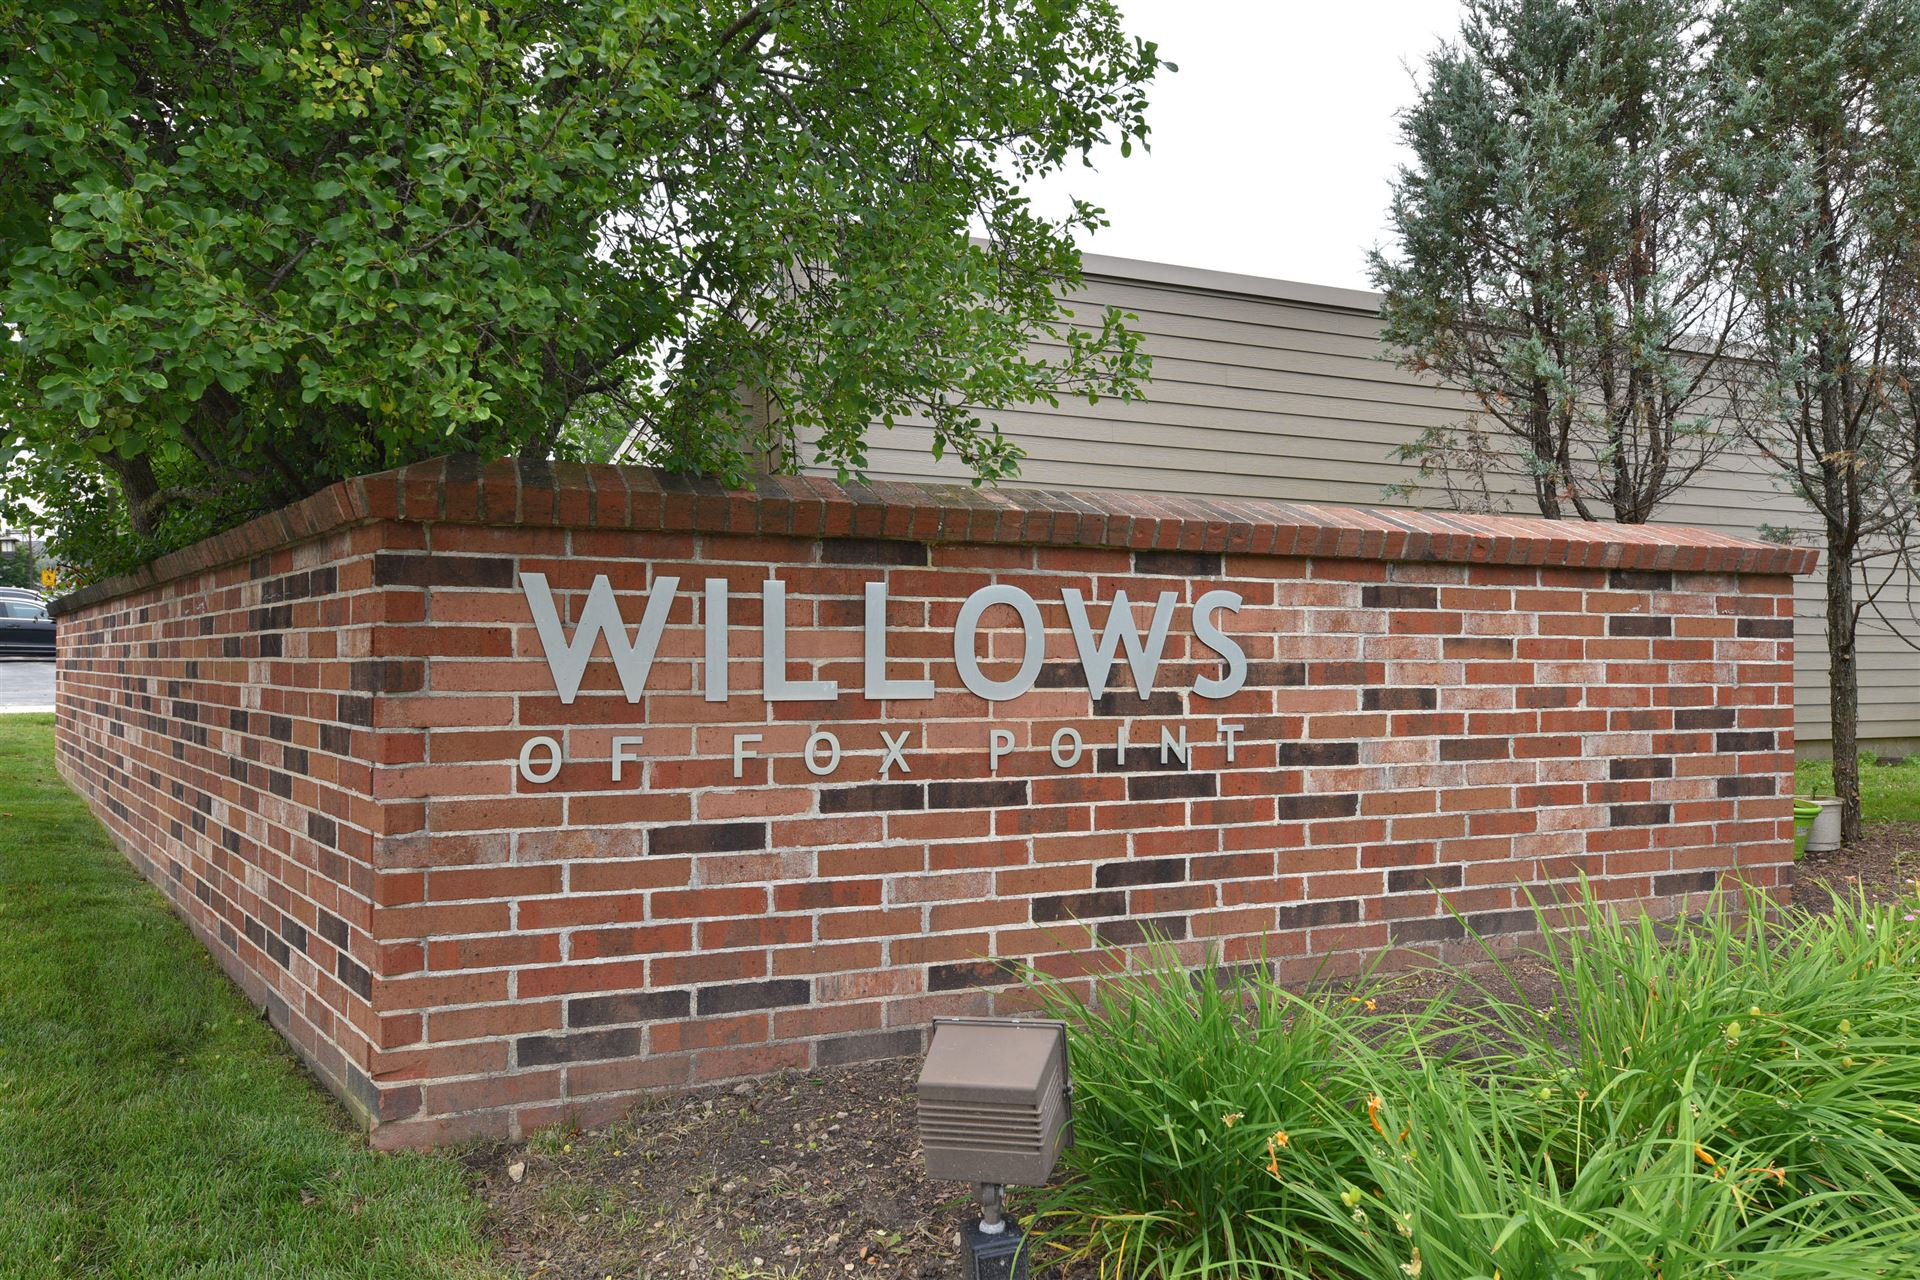 490 W Willow Ct, Fox Point, WI 53217 - #: 1698879